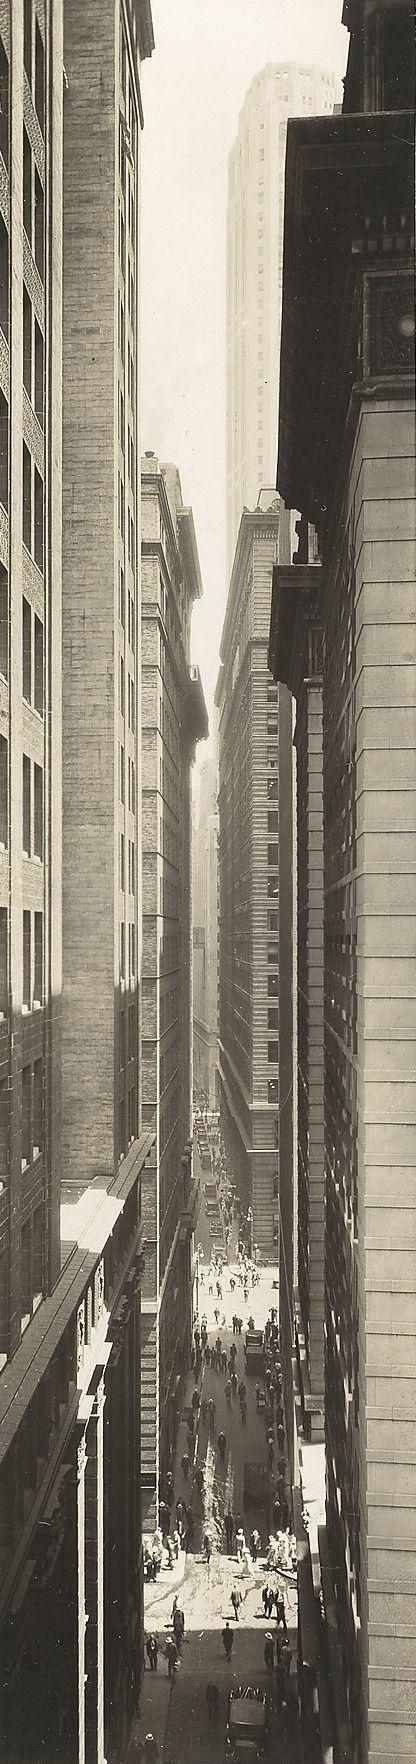 """Exchange Place"" Author: Berenice Abbott (American, 1898-1991) Date: 1933 Medium: Gelatin silver print Location: The Metropolitan Museum of Art, New York"